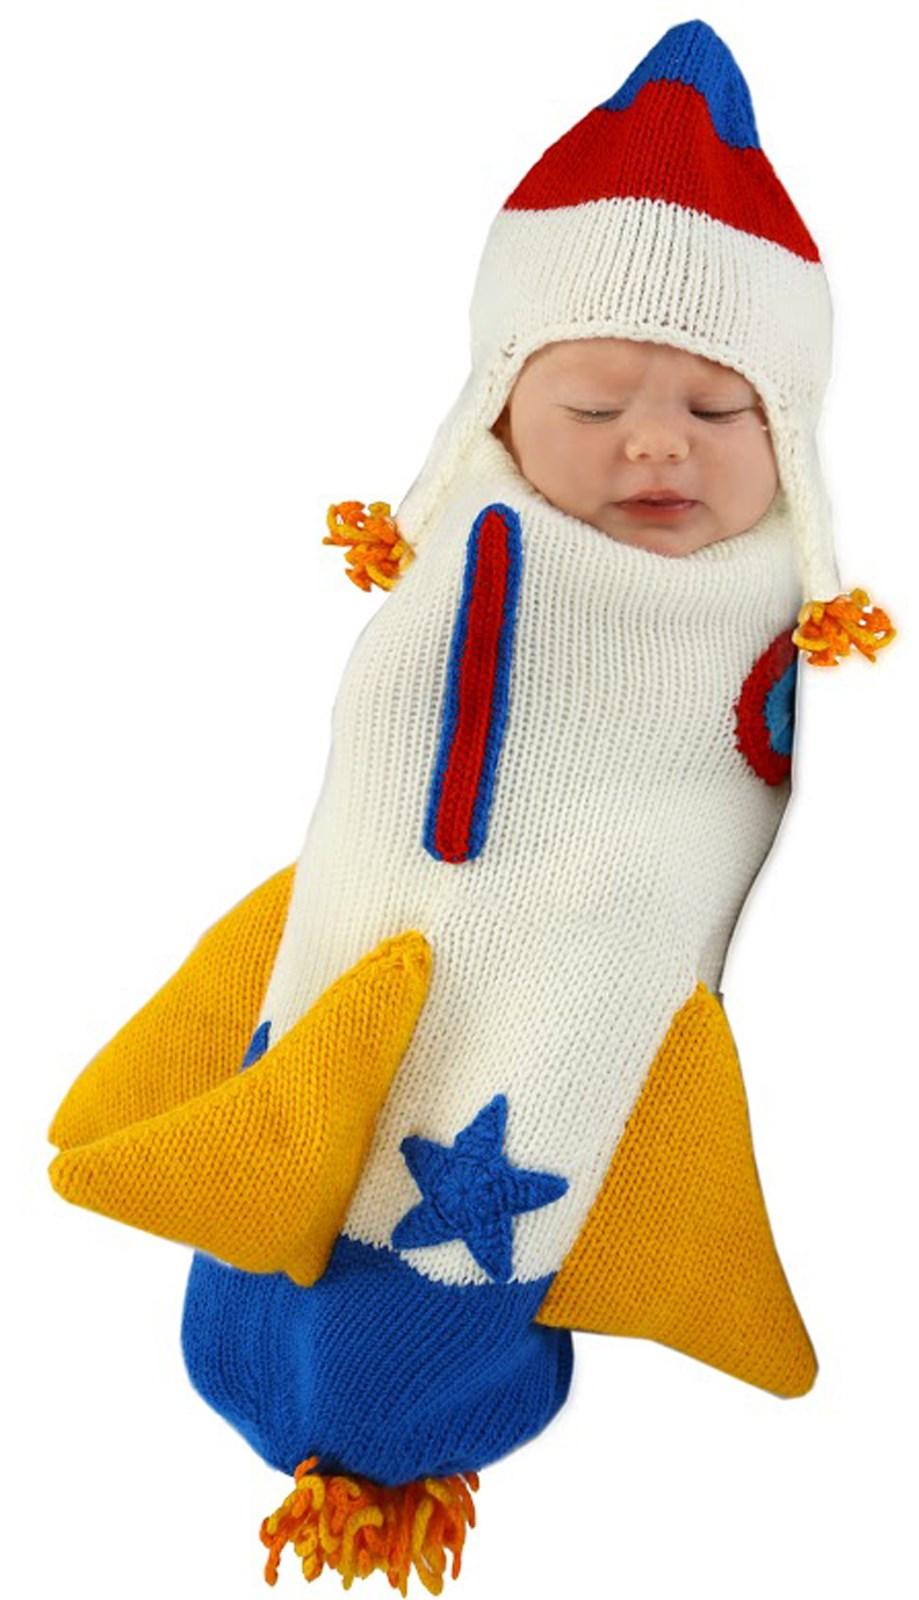 Roger the Rocket Ship Bunting Infant Costume